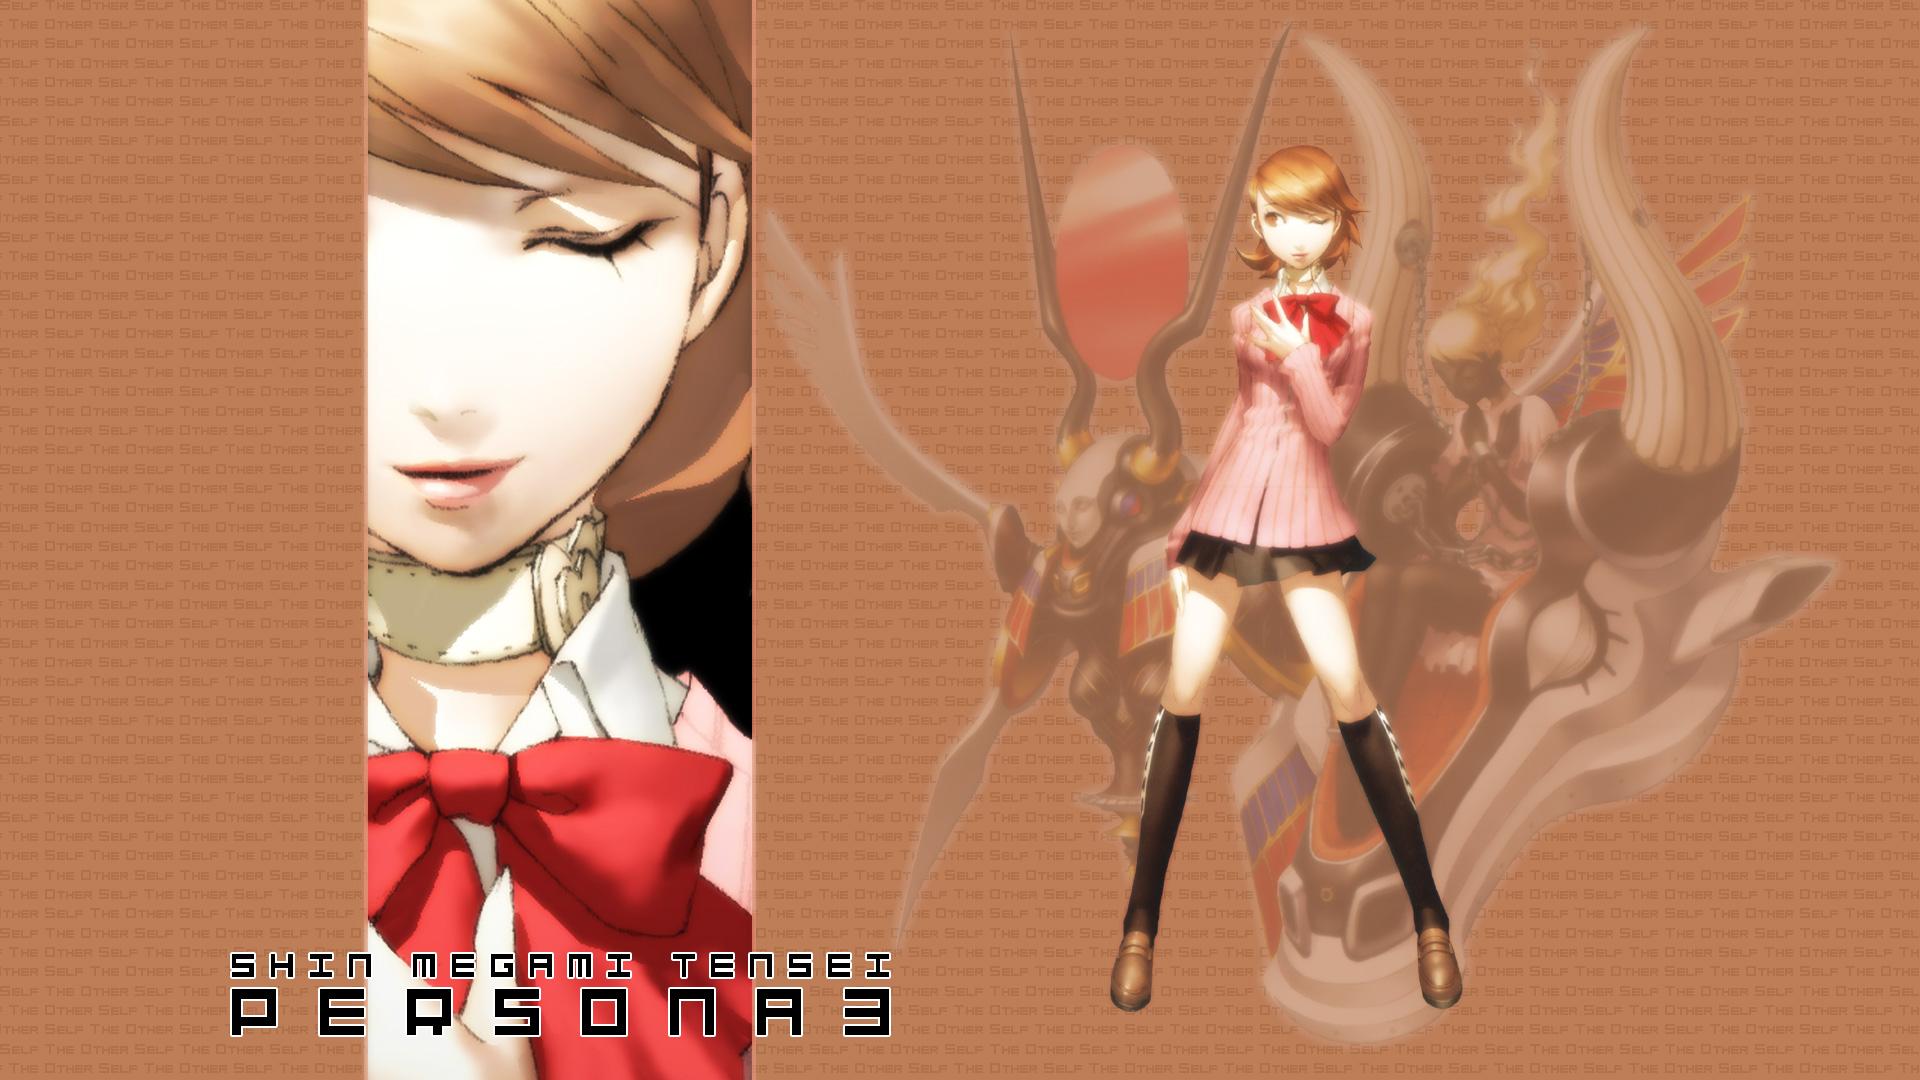 persona wallpaper 3